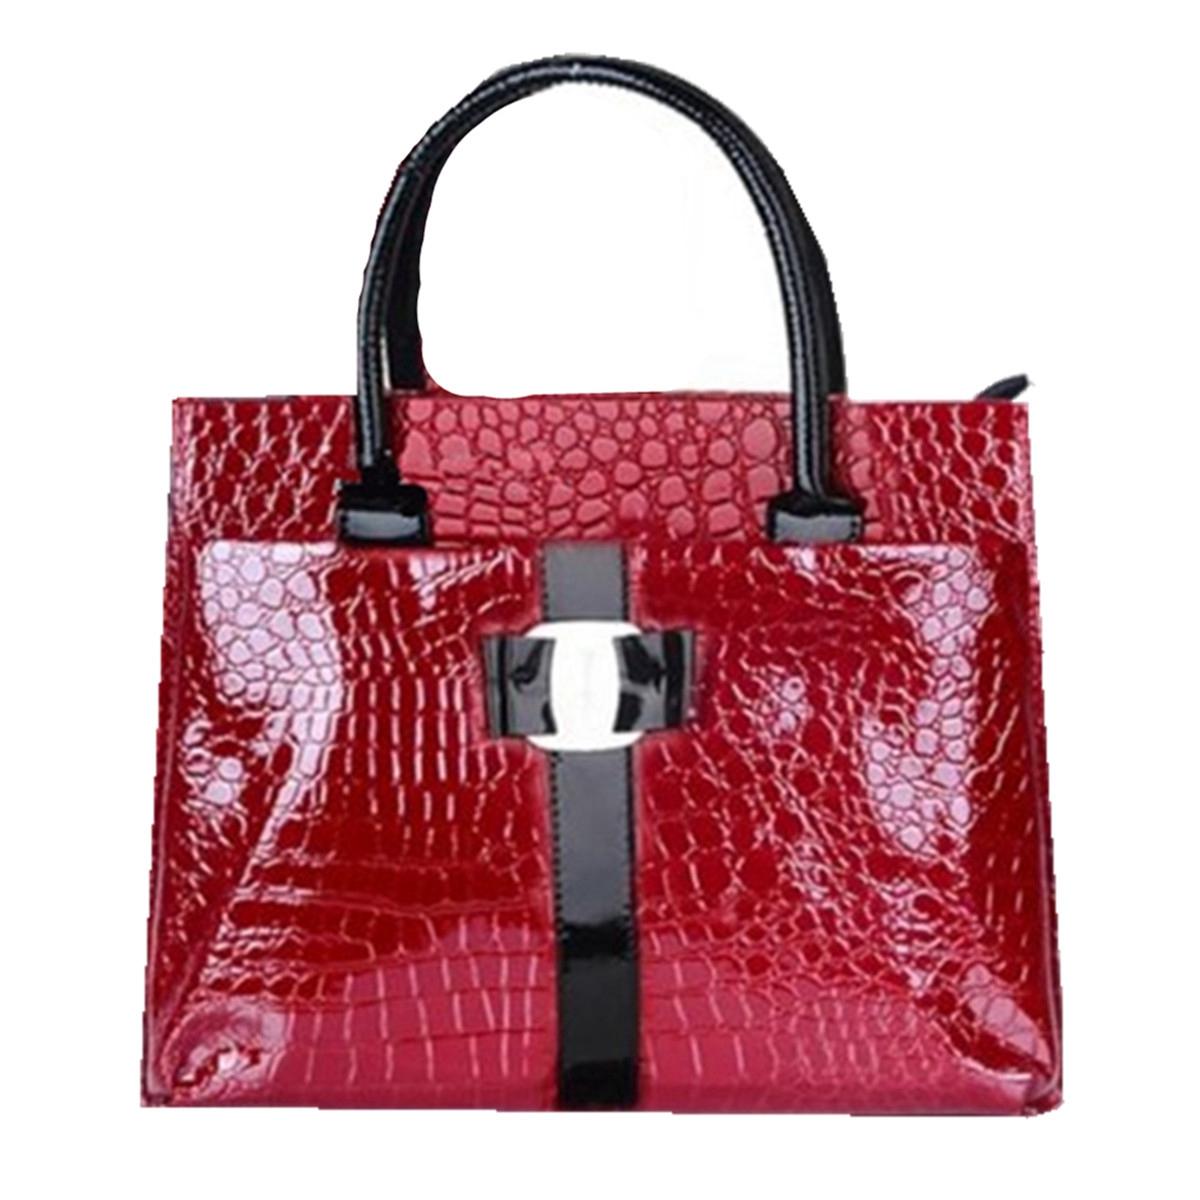 Women OL Lady Crocodile Pattern Leather Shoulder Bag Handbag Satchel Tote New